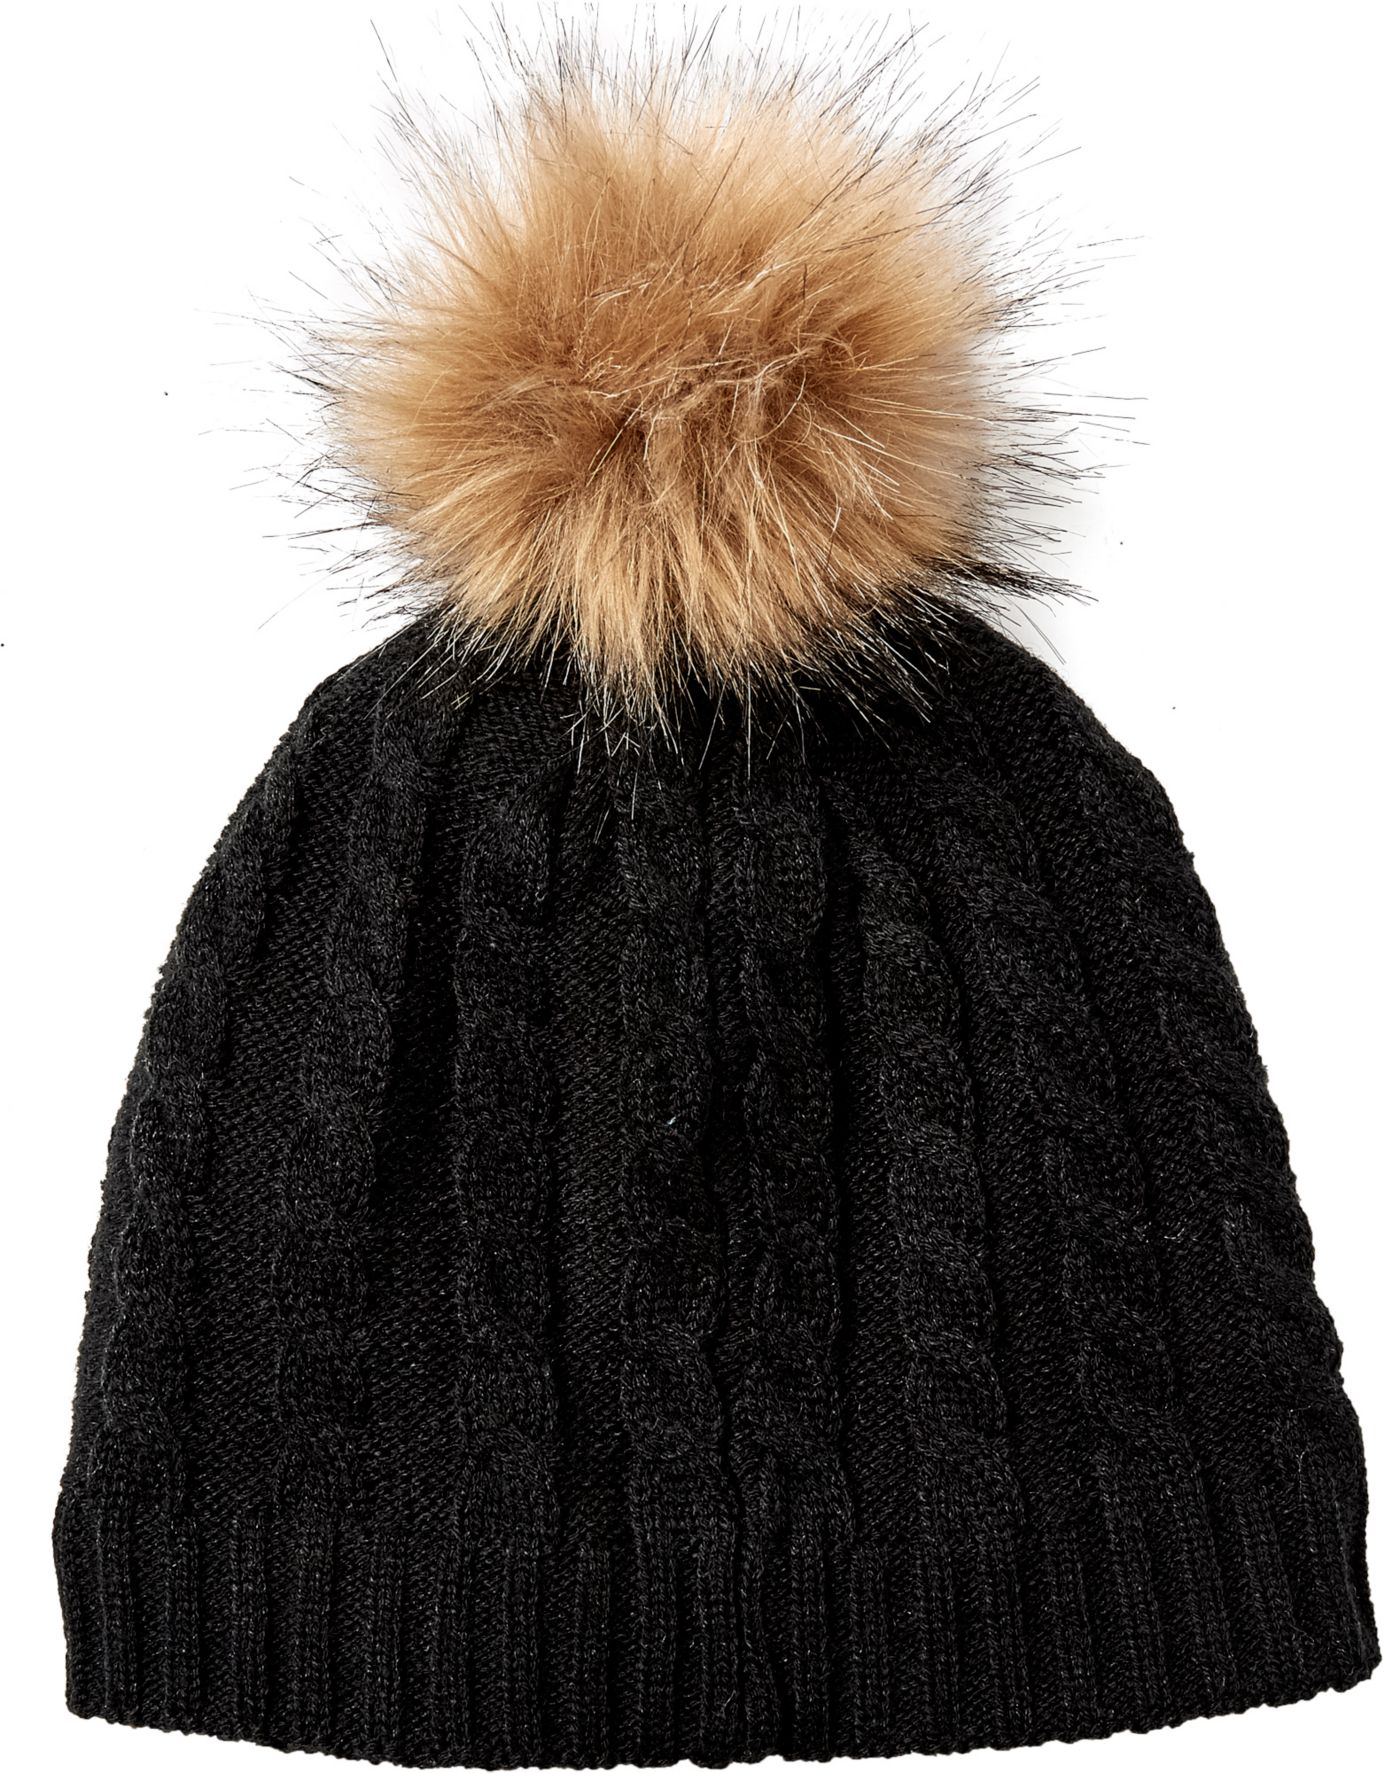 Field & Stream Women's Cabin Cable Fur Pom Beanie